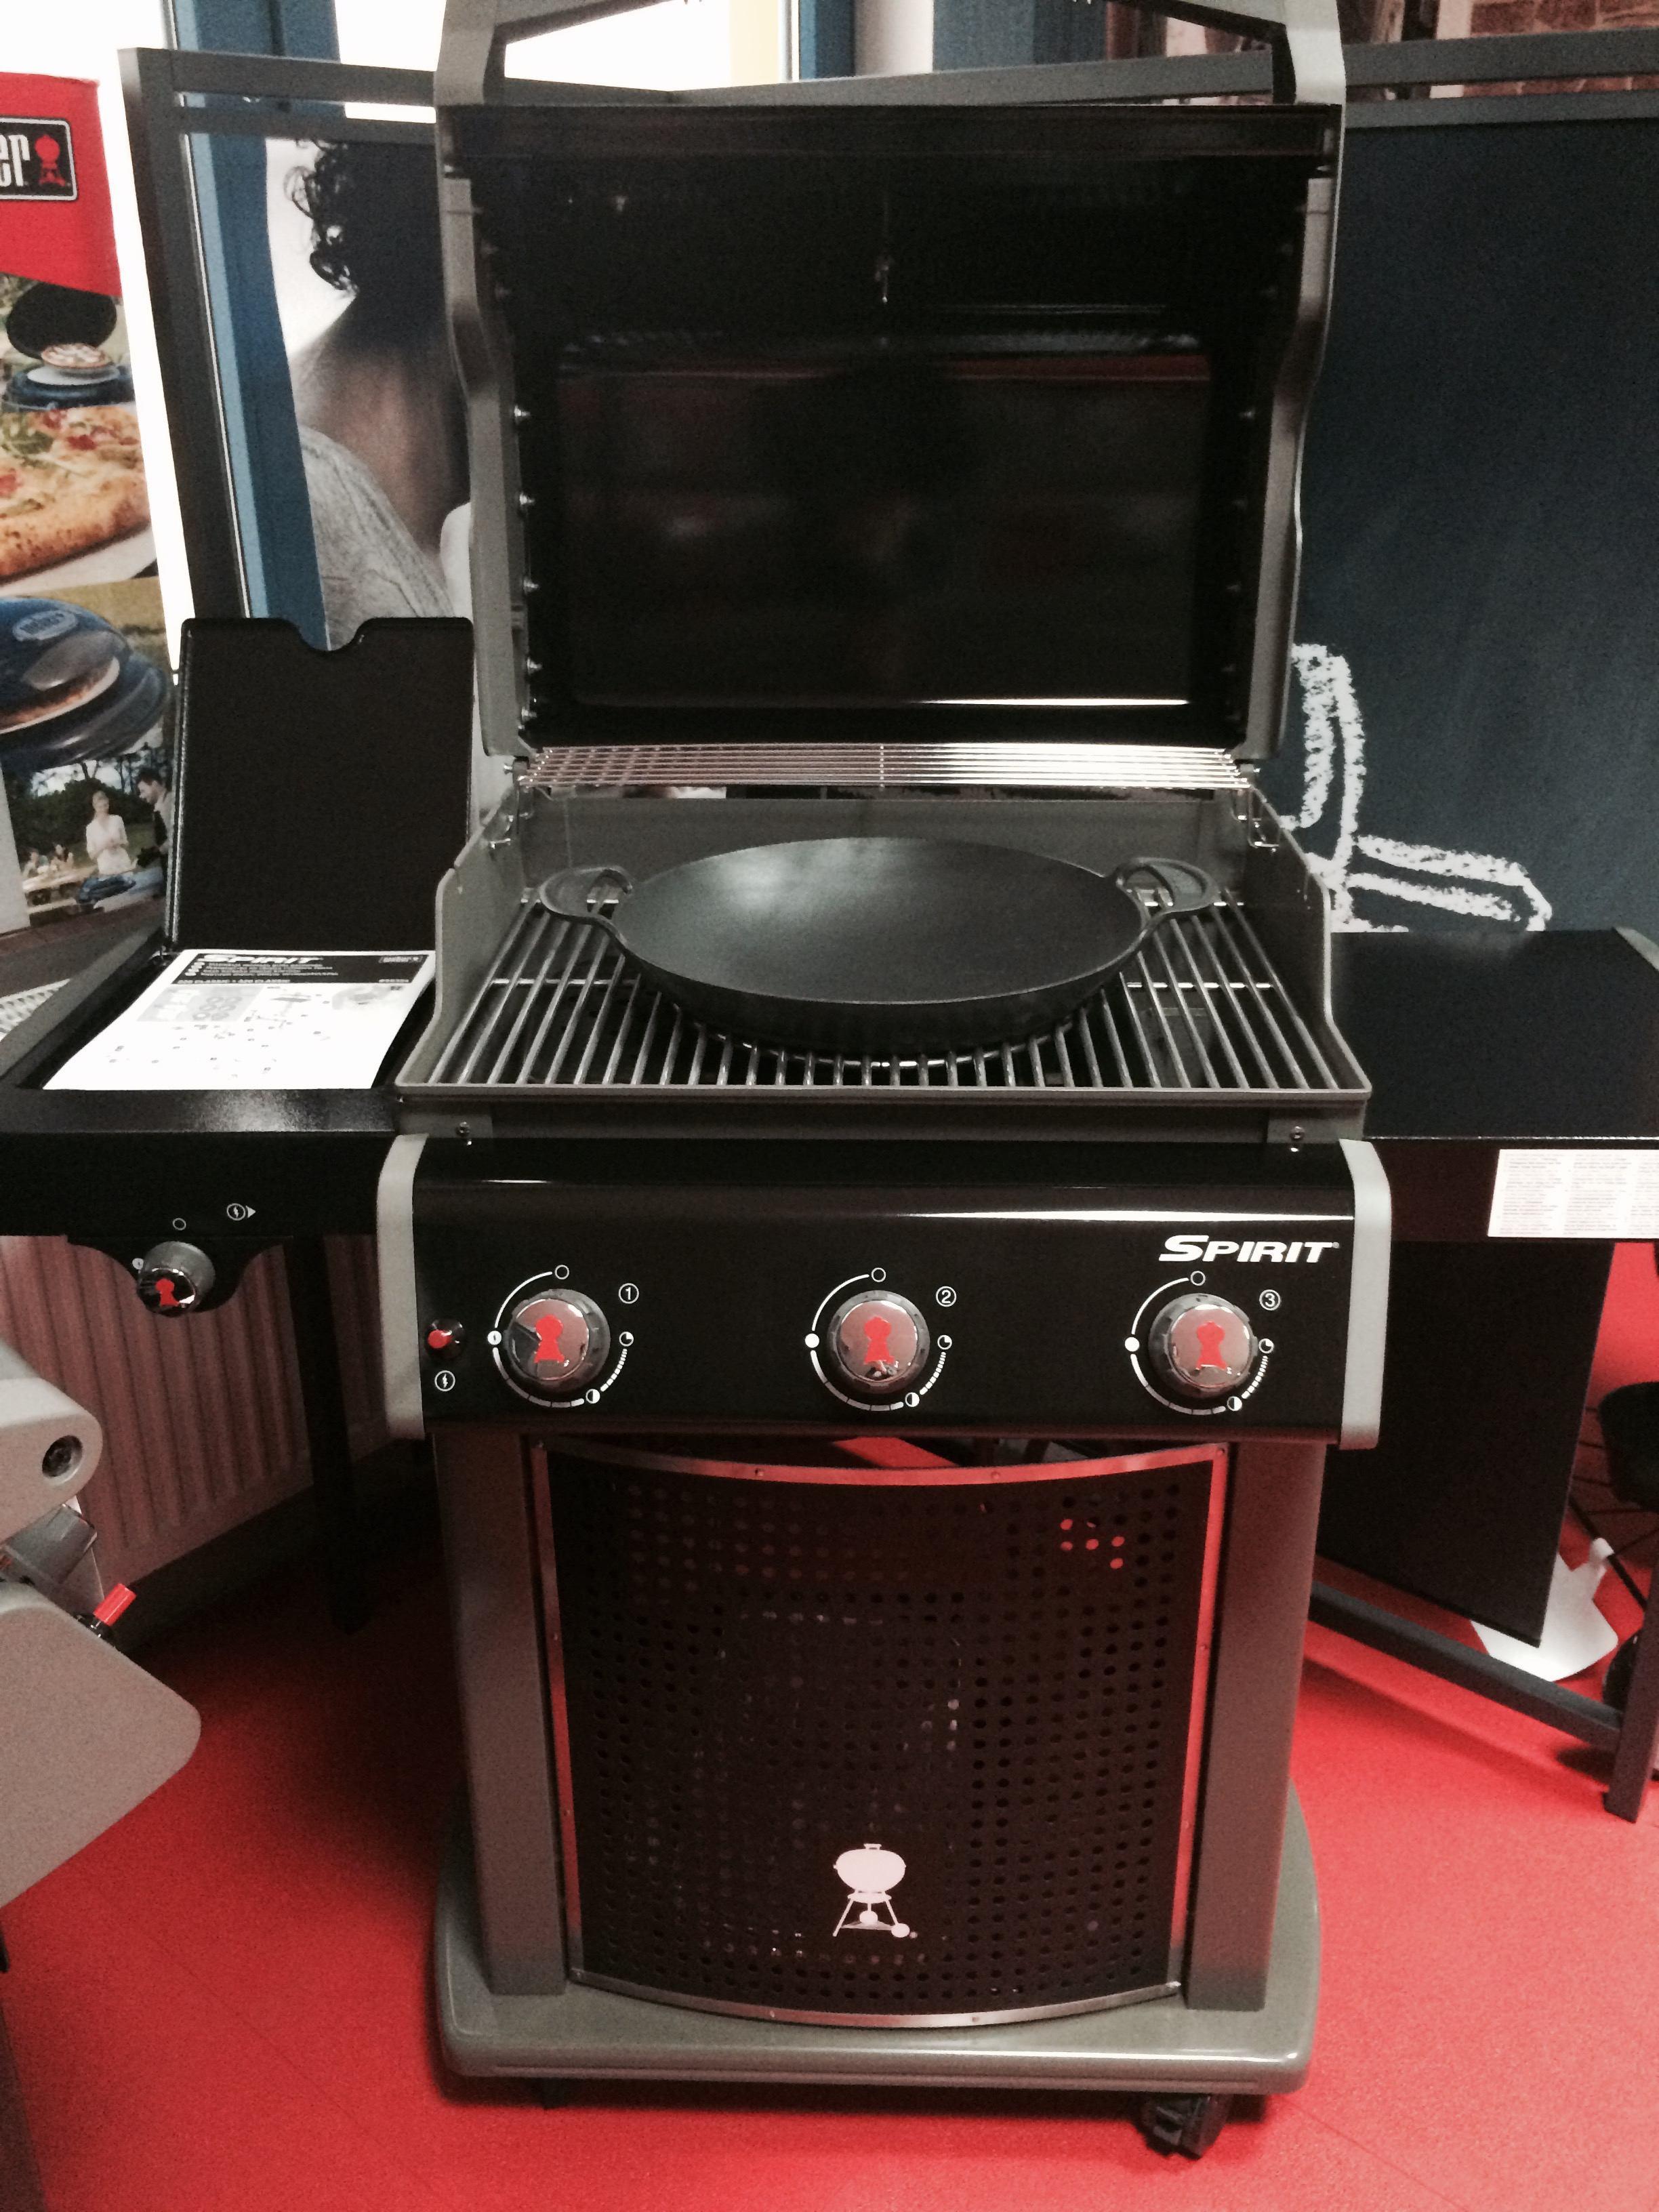 decofire-grill-weber-w-polsce-3